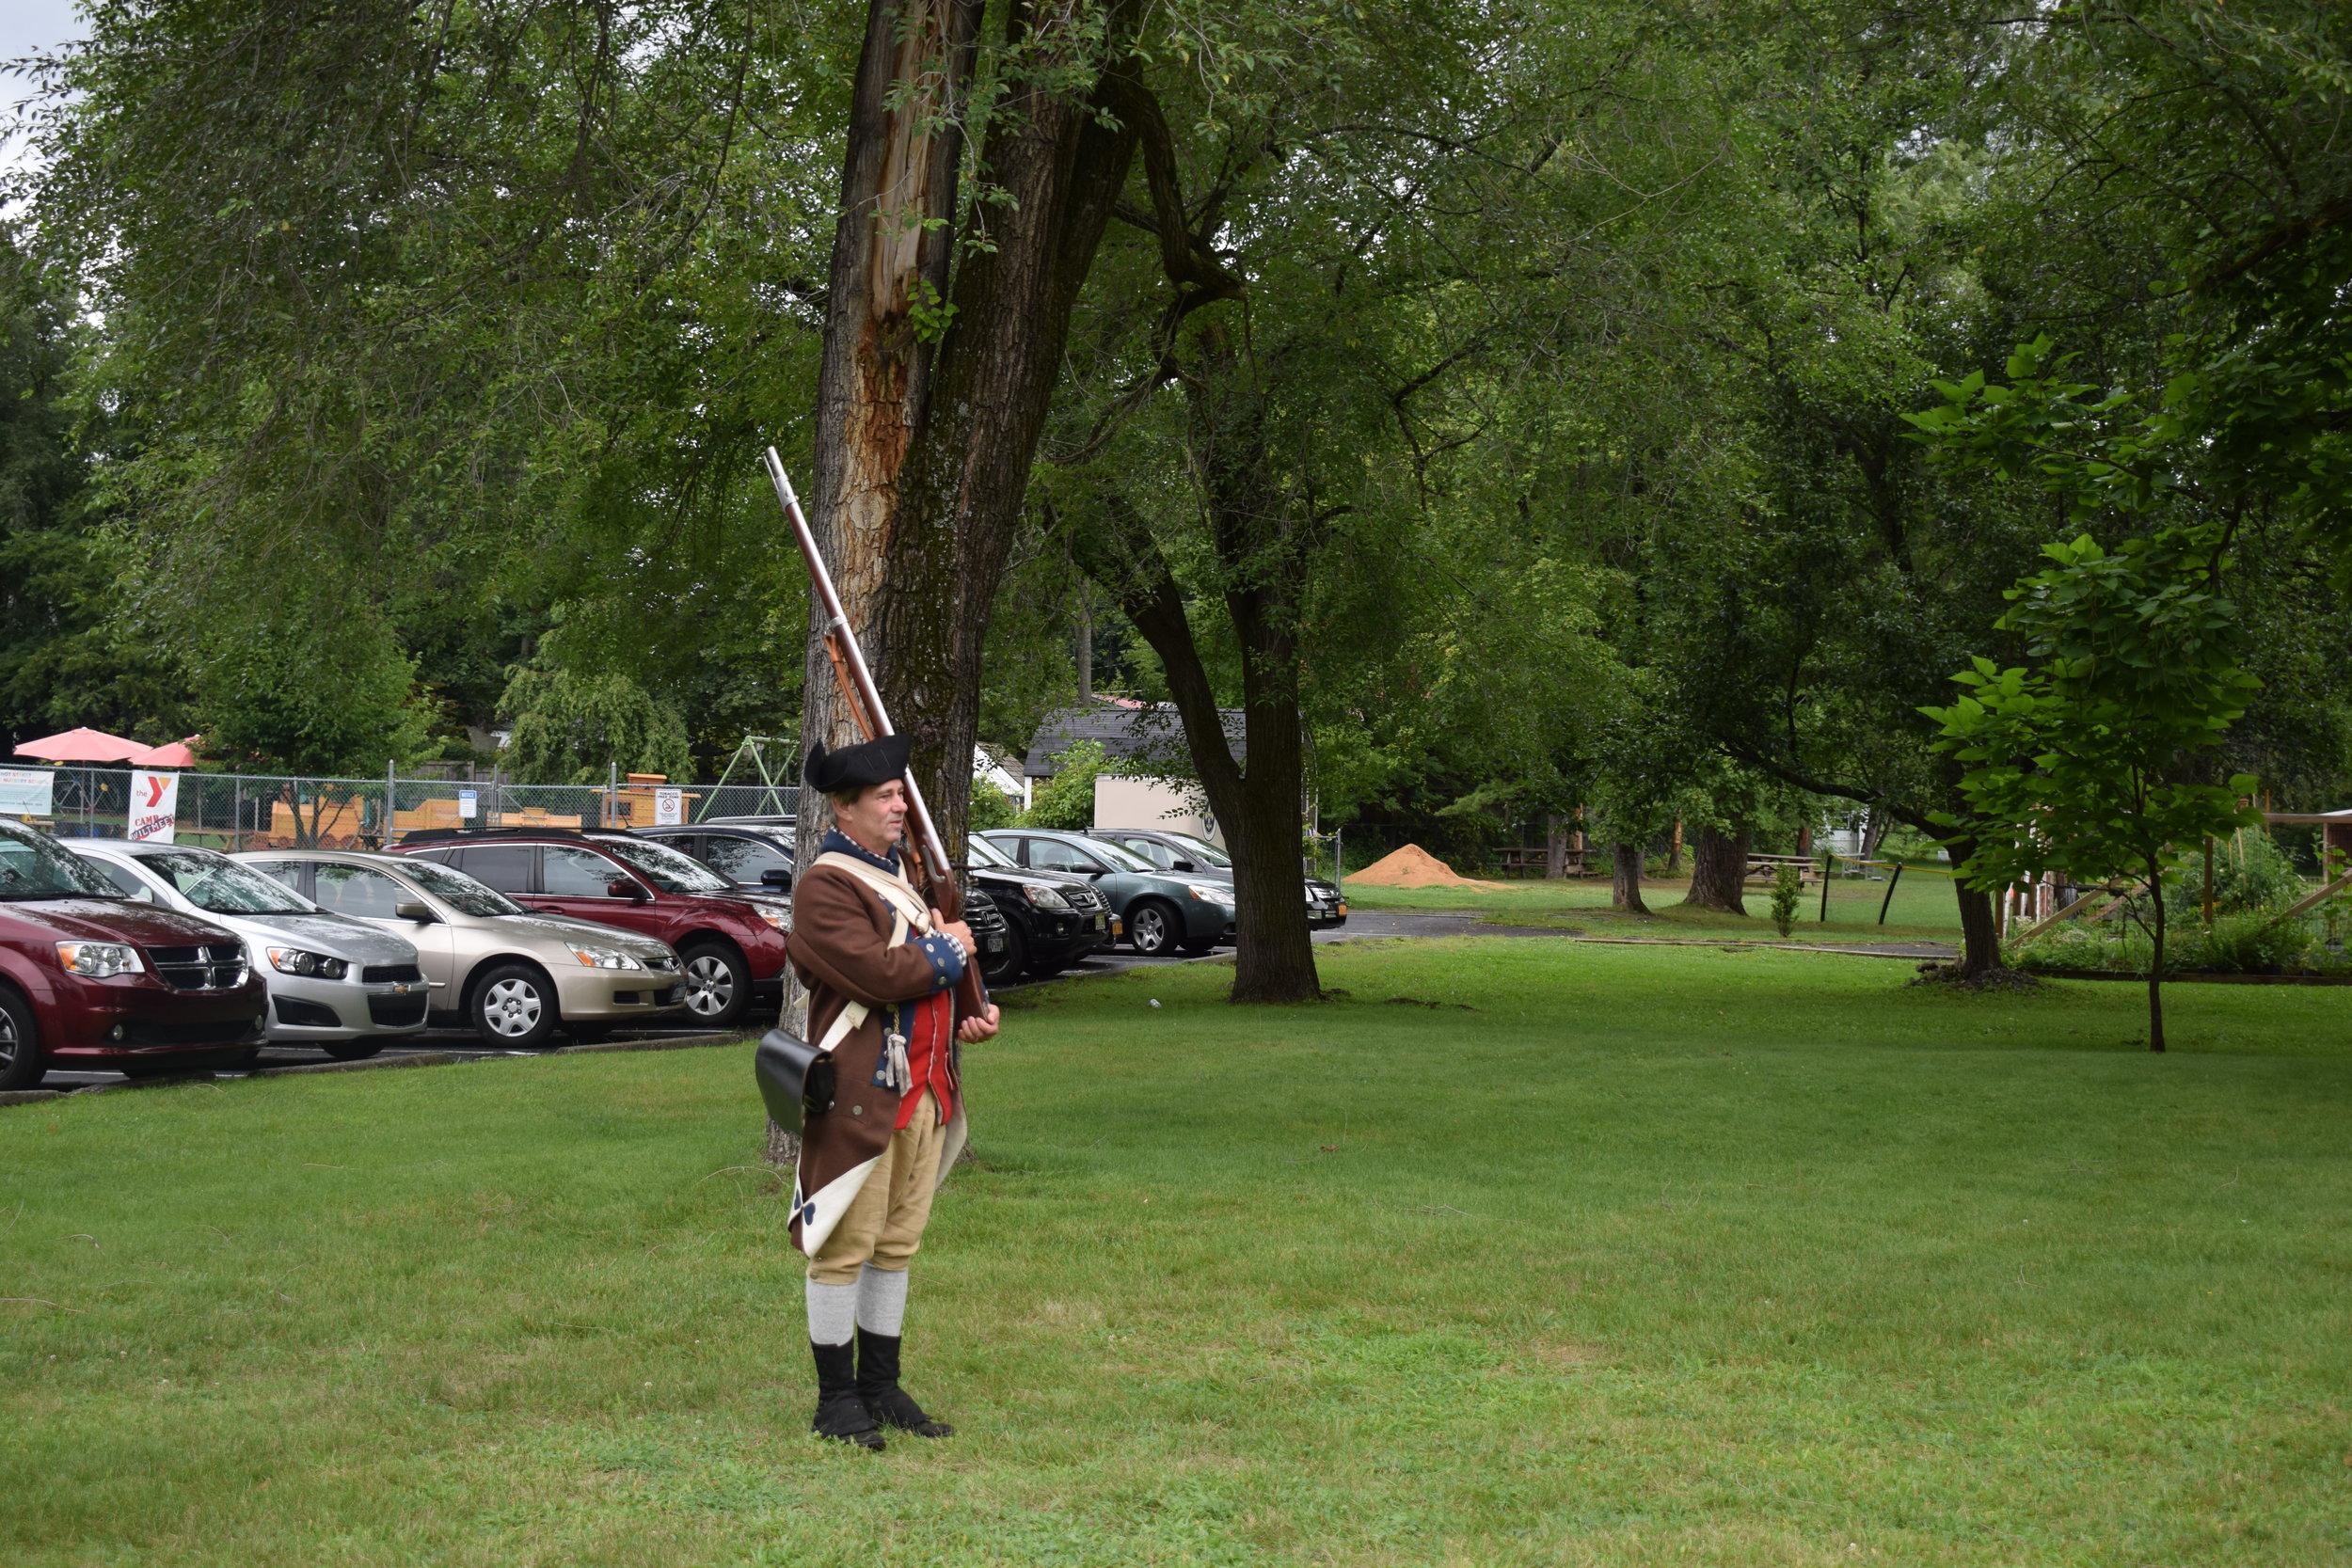 Reenactor LeRoy Hogan prepares his musket